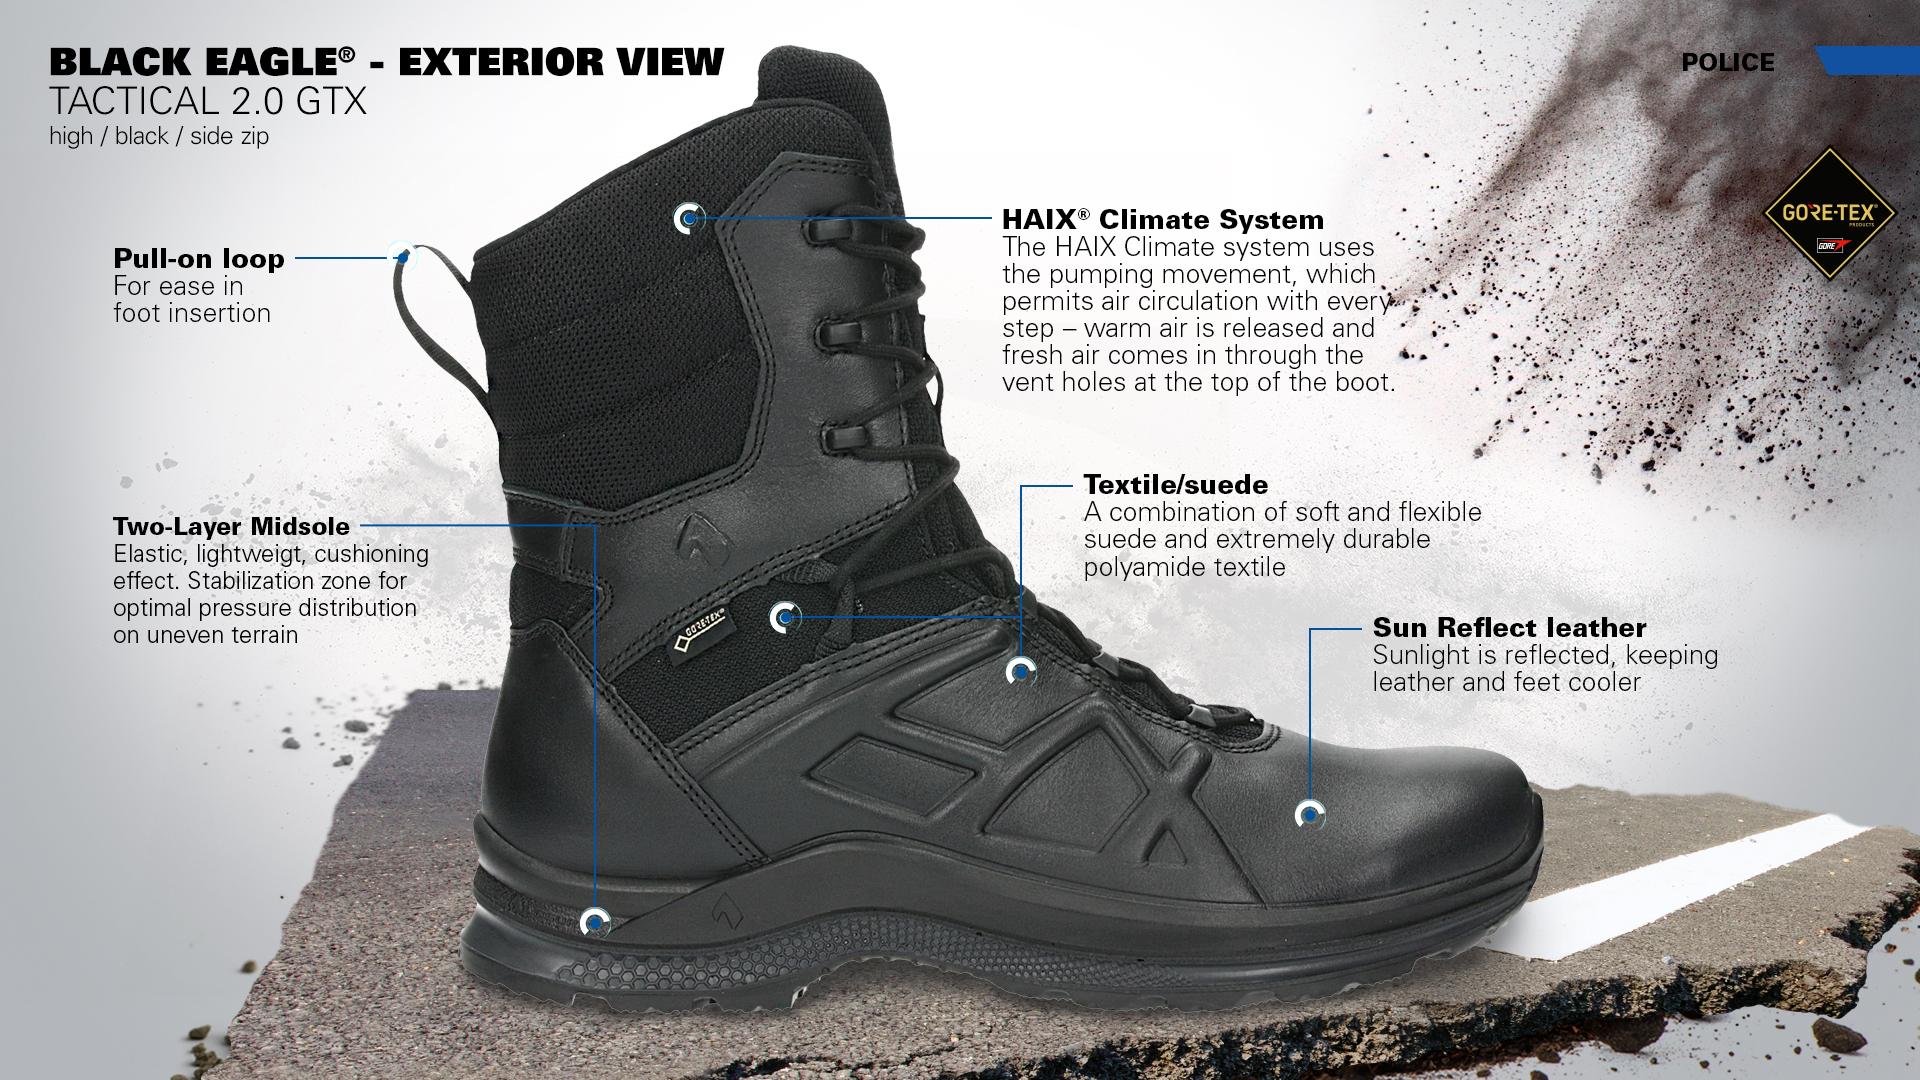 Black Eagle Tactical 2.0 GTX High Side Zip